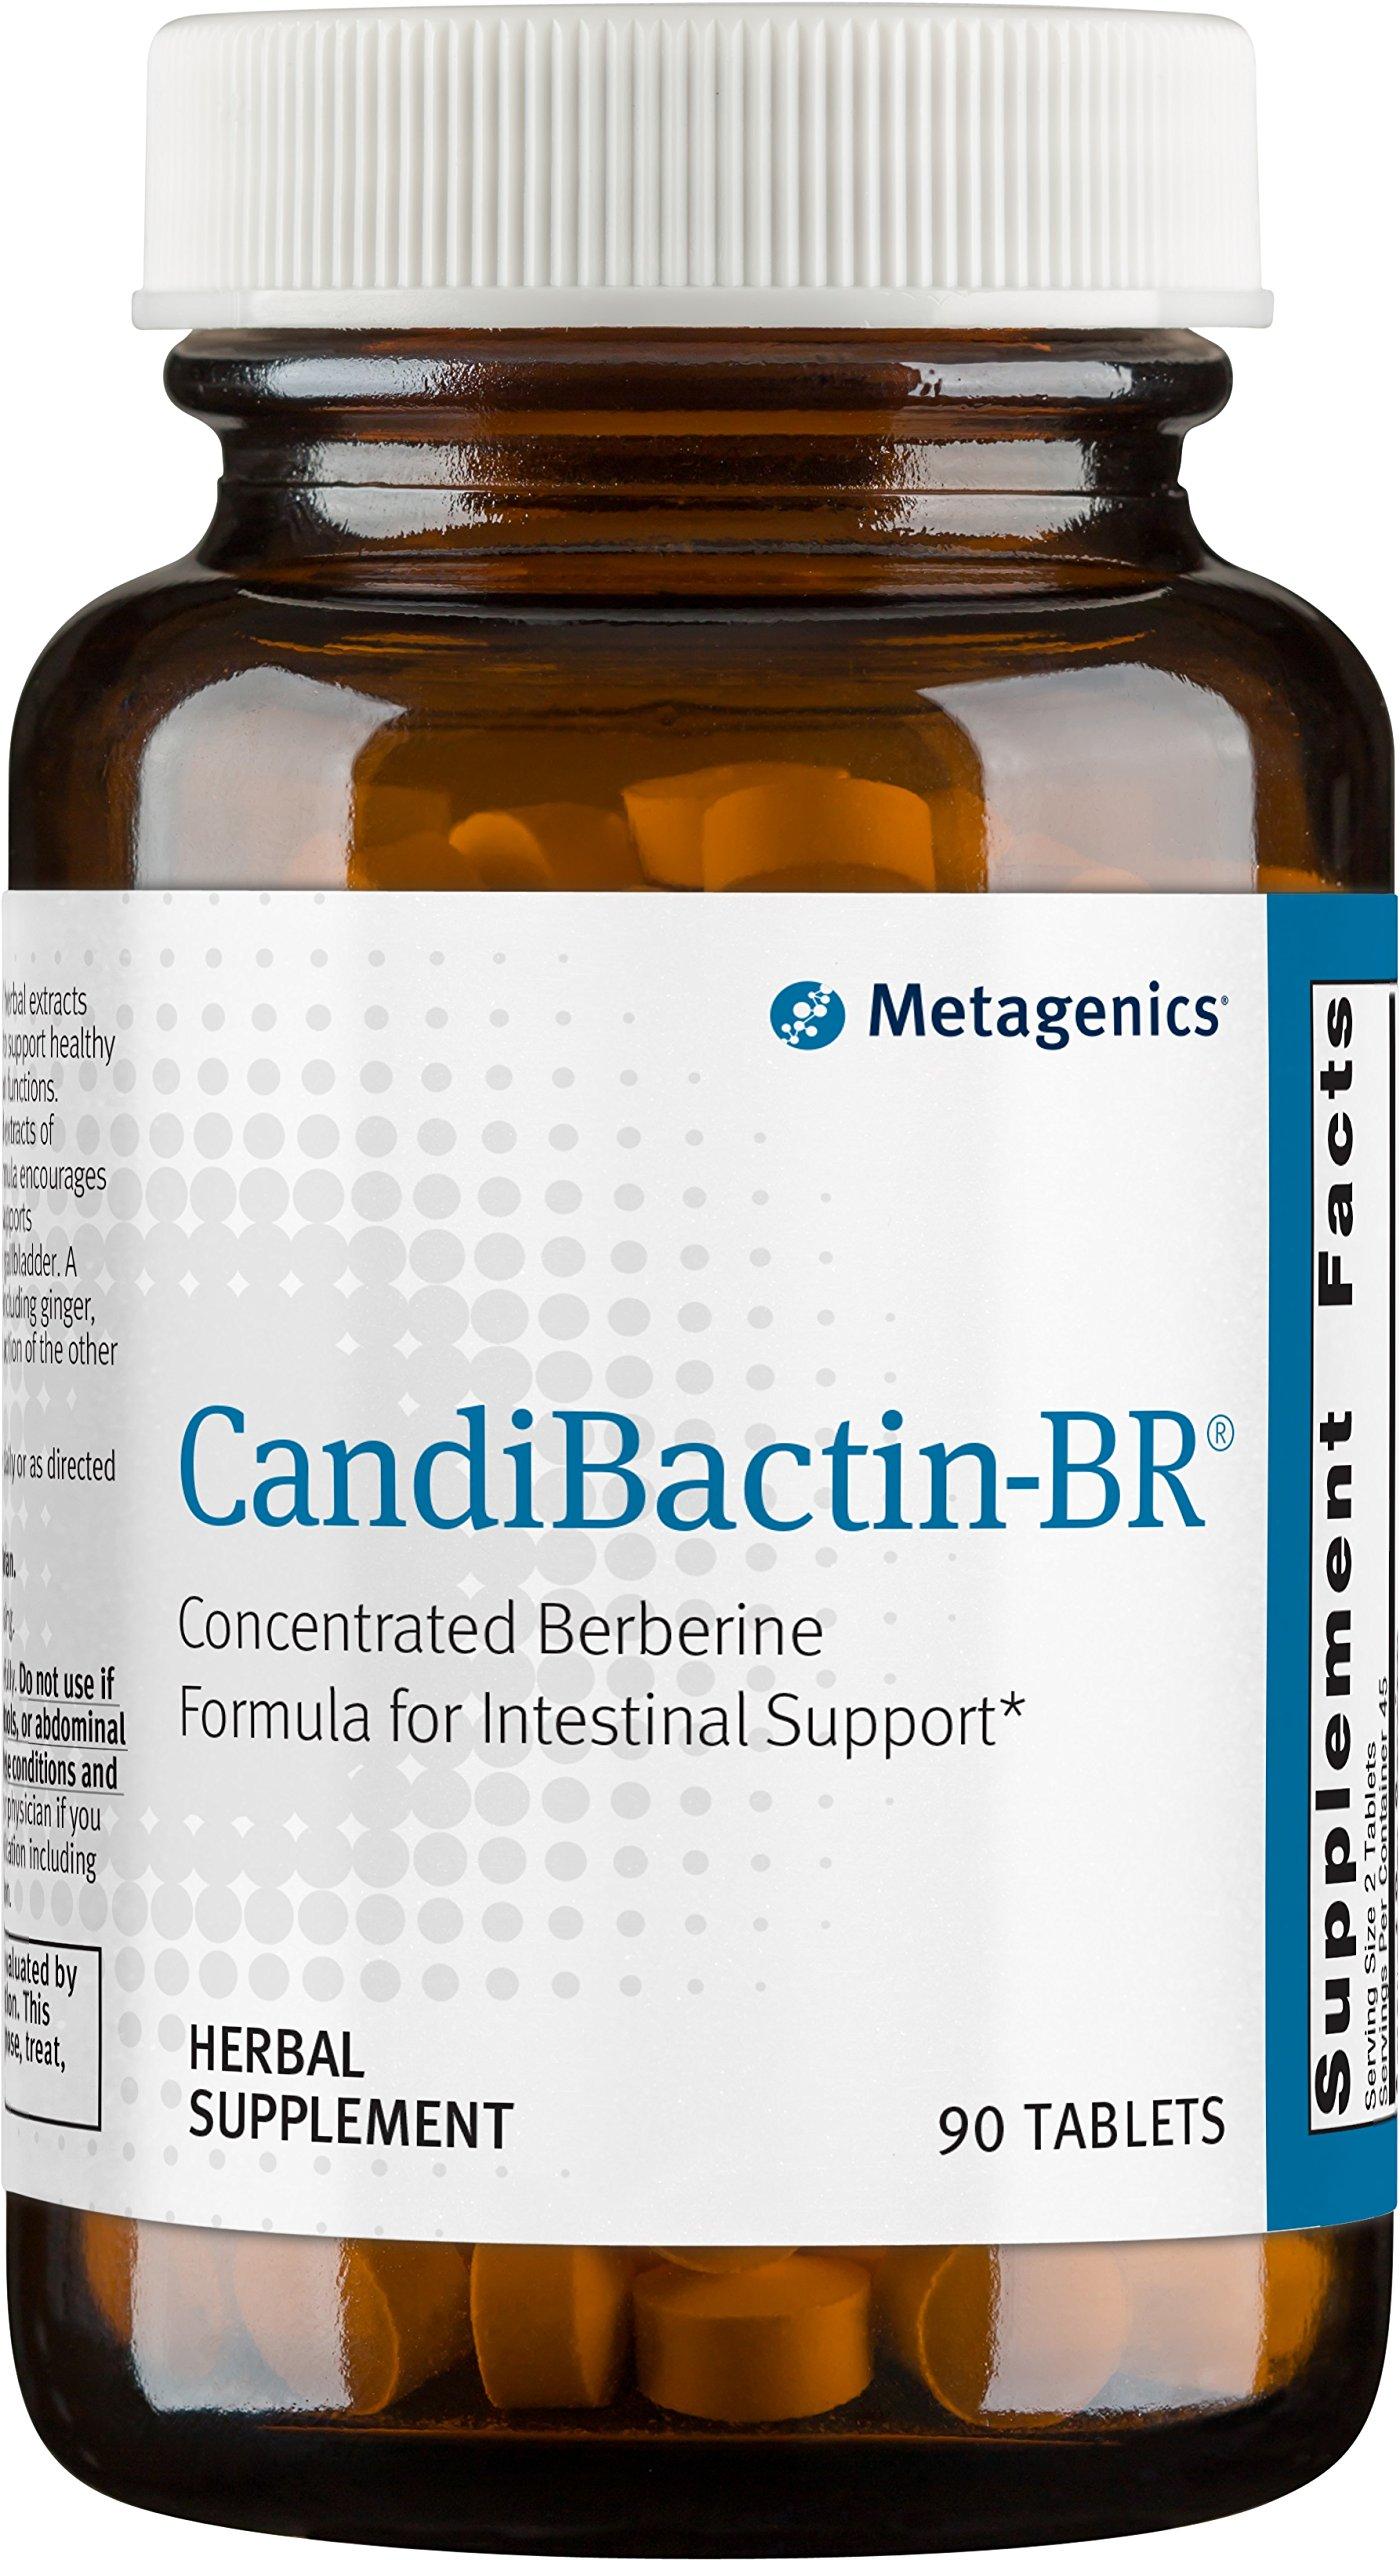 Metagenics - CandiBactin-BR, 90 Count